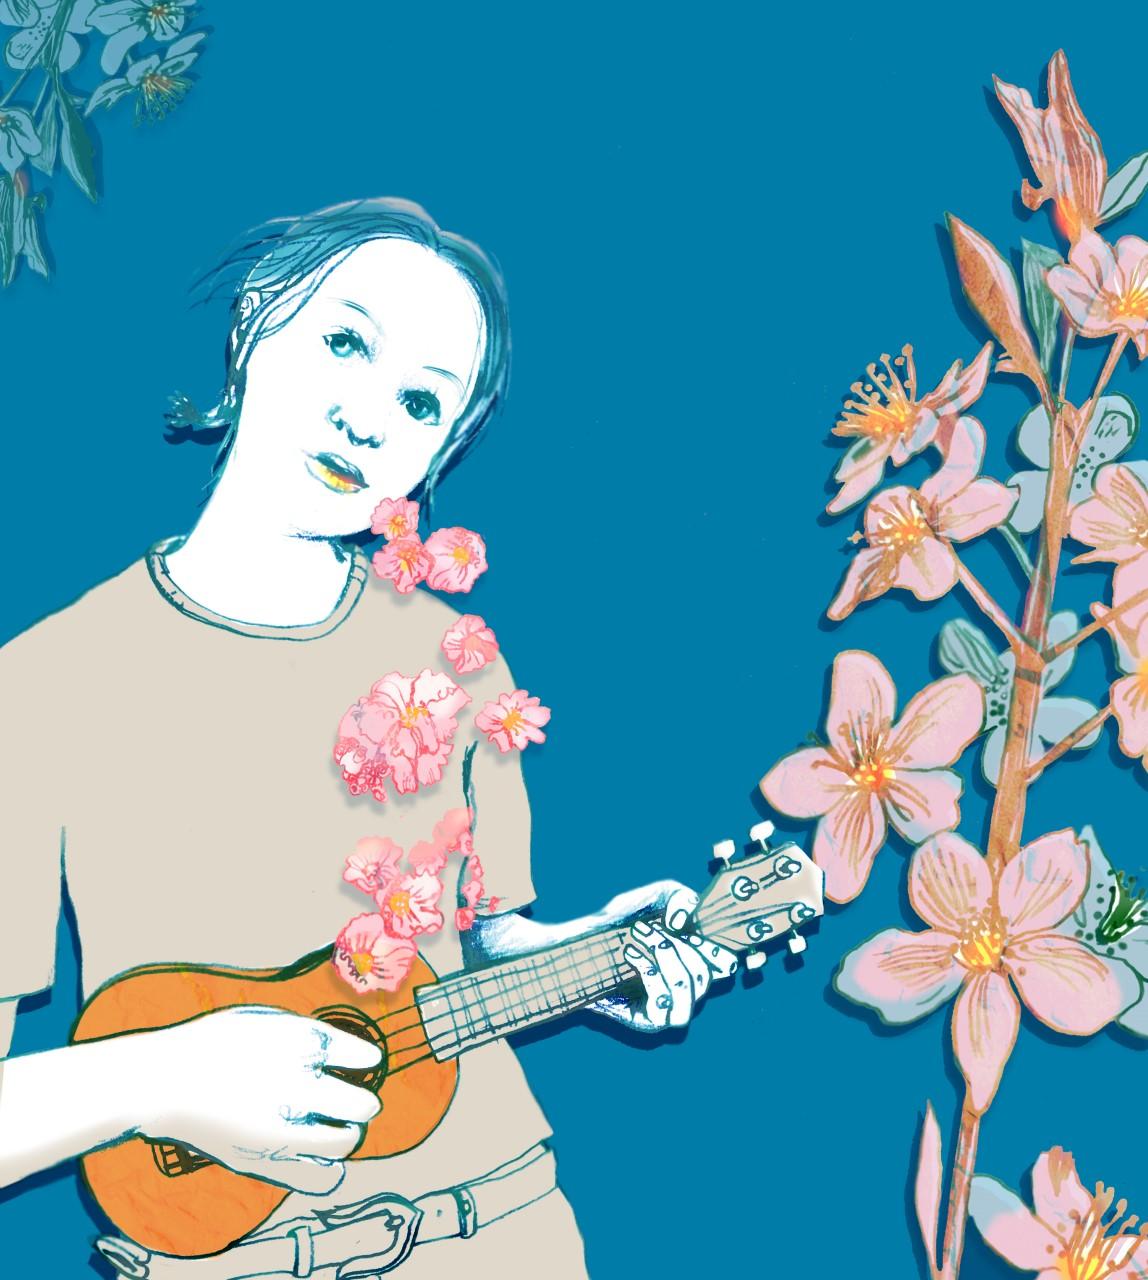 thumbnail_girl with ukulele 2.jpg